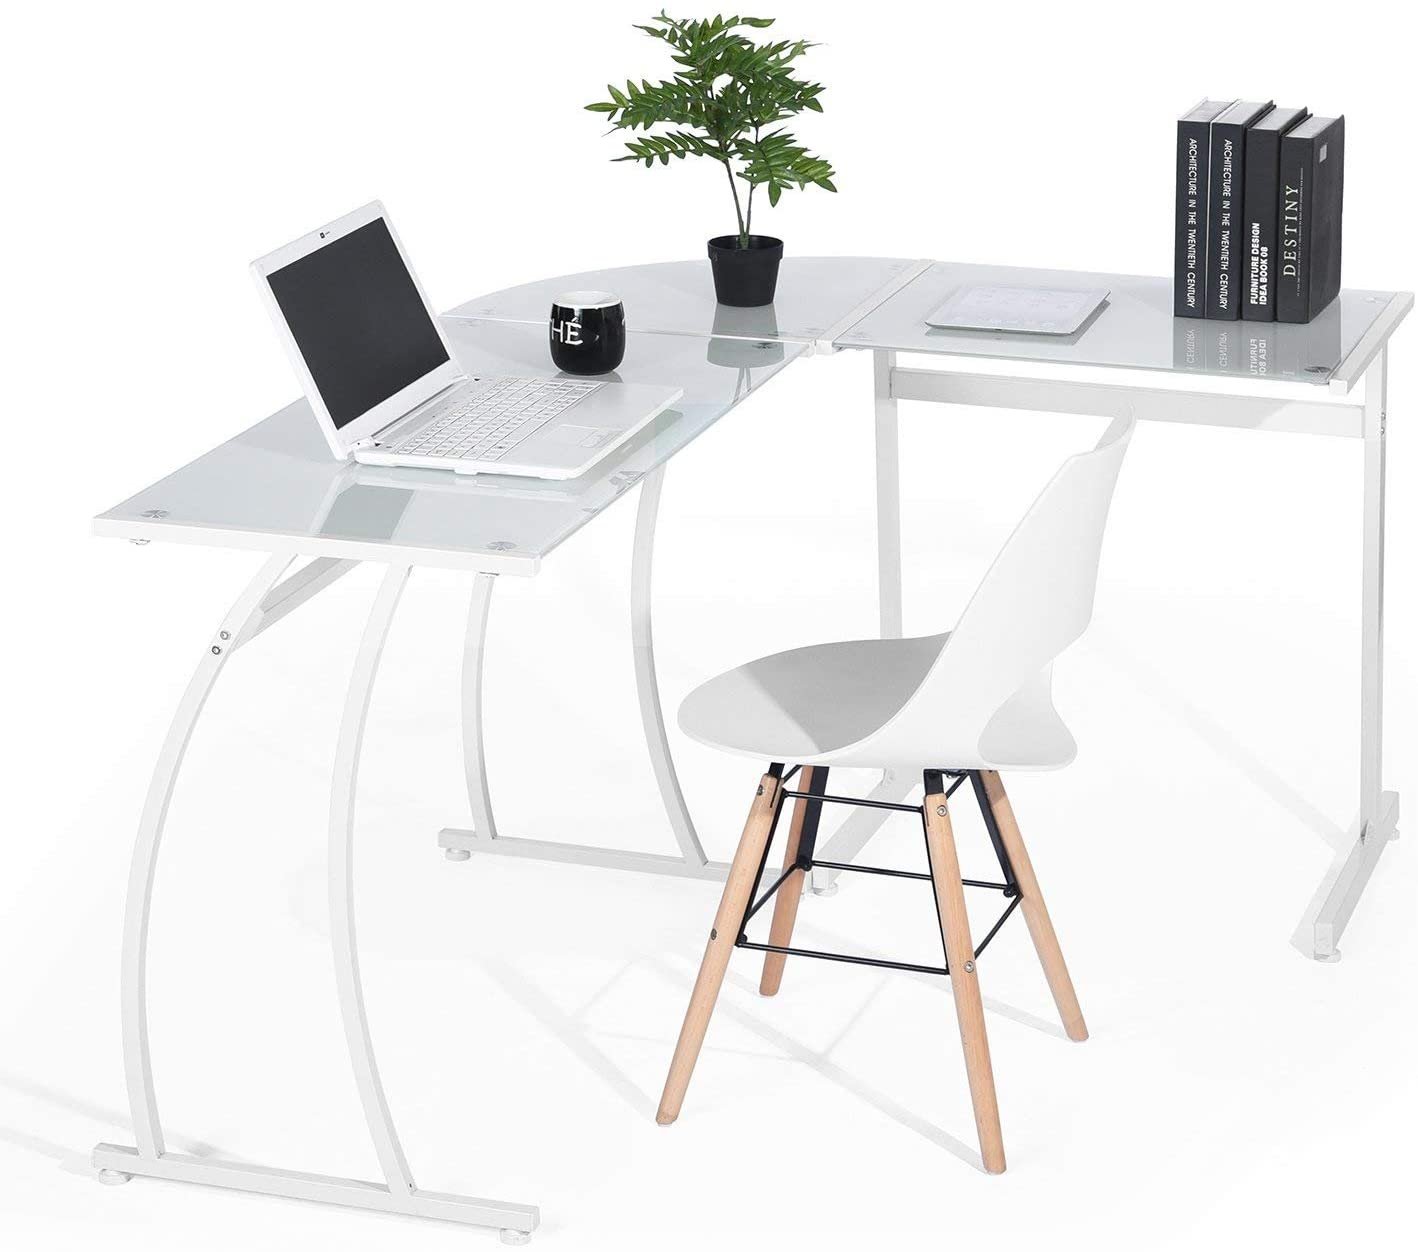 Coavas Wooden Desks